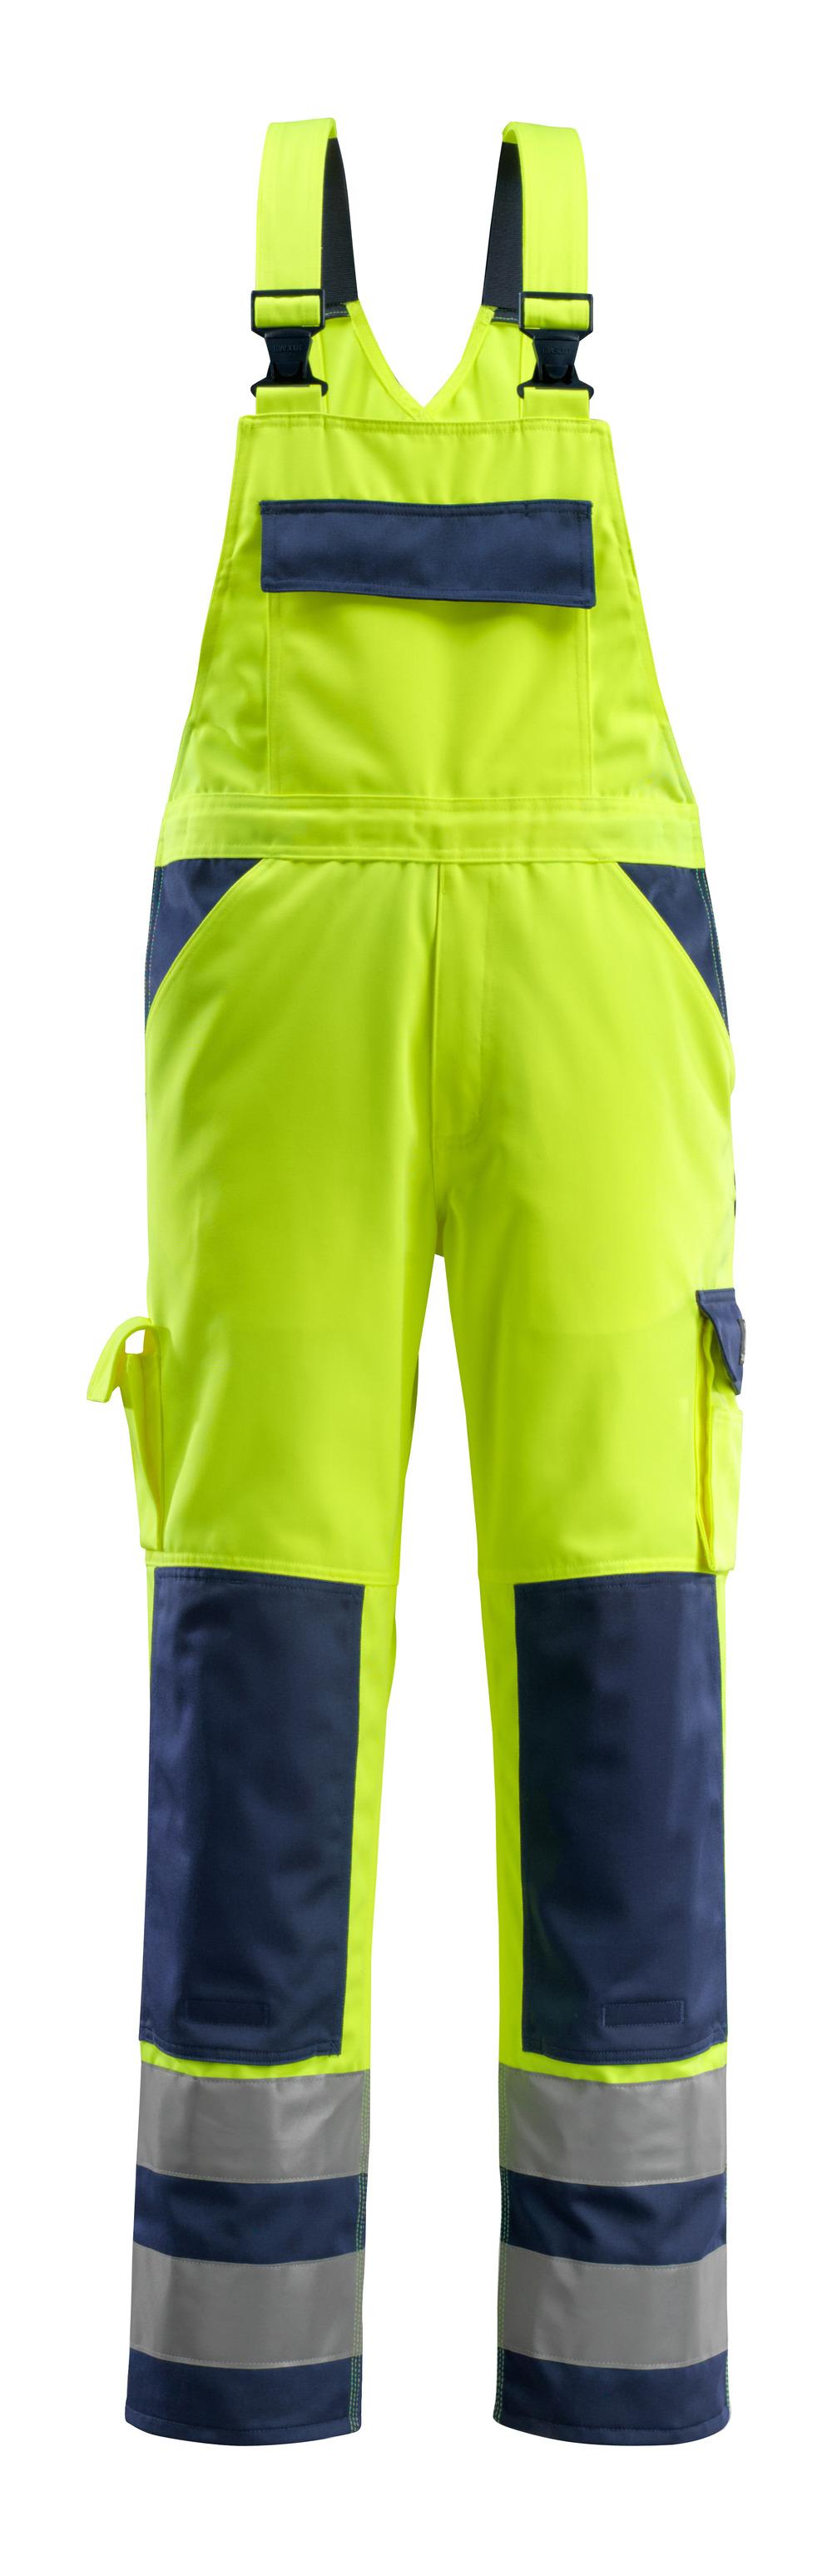 07169-470-171 Salopette con tasche porta-ginocchiere - giallo hi-vis/blu navy